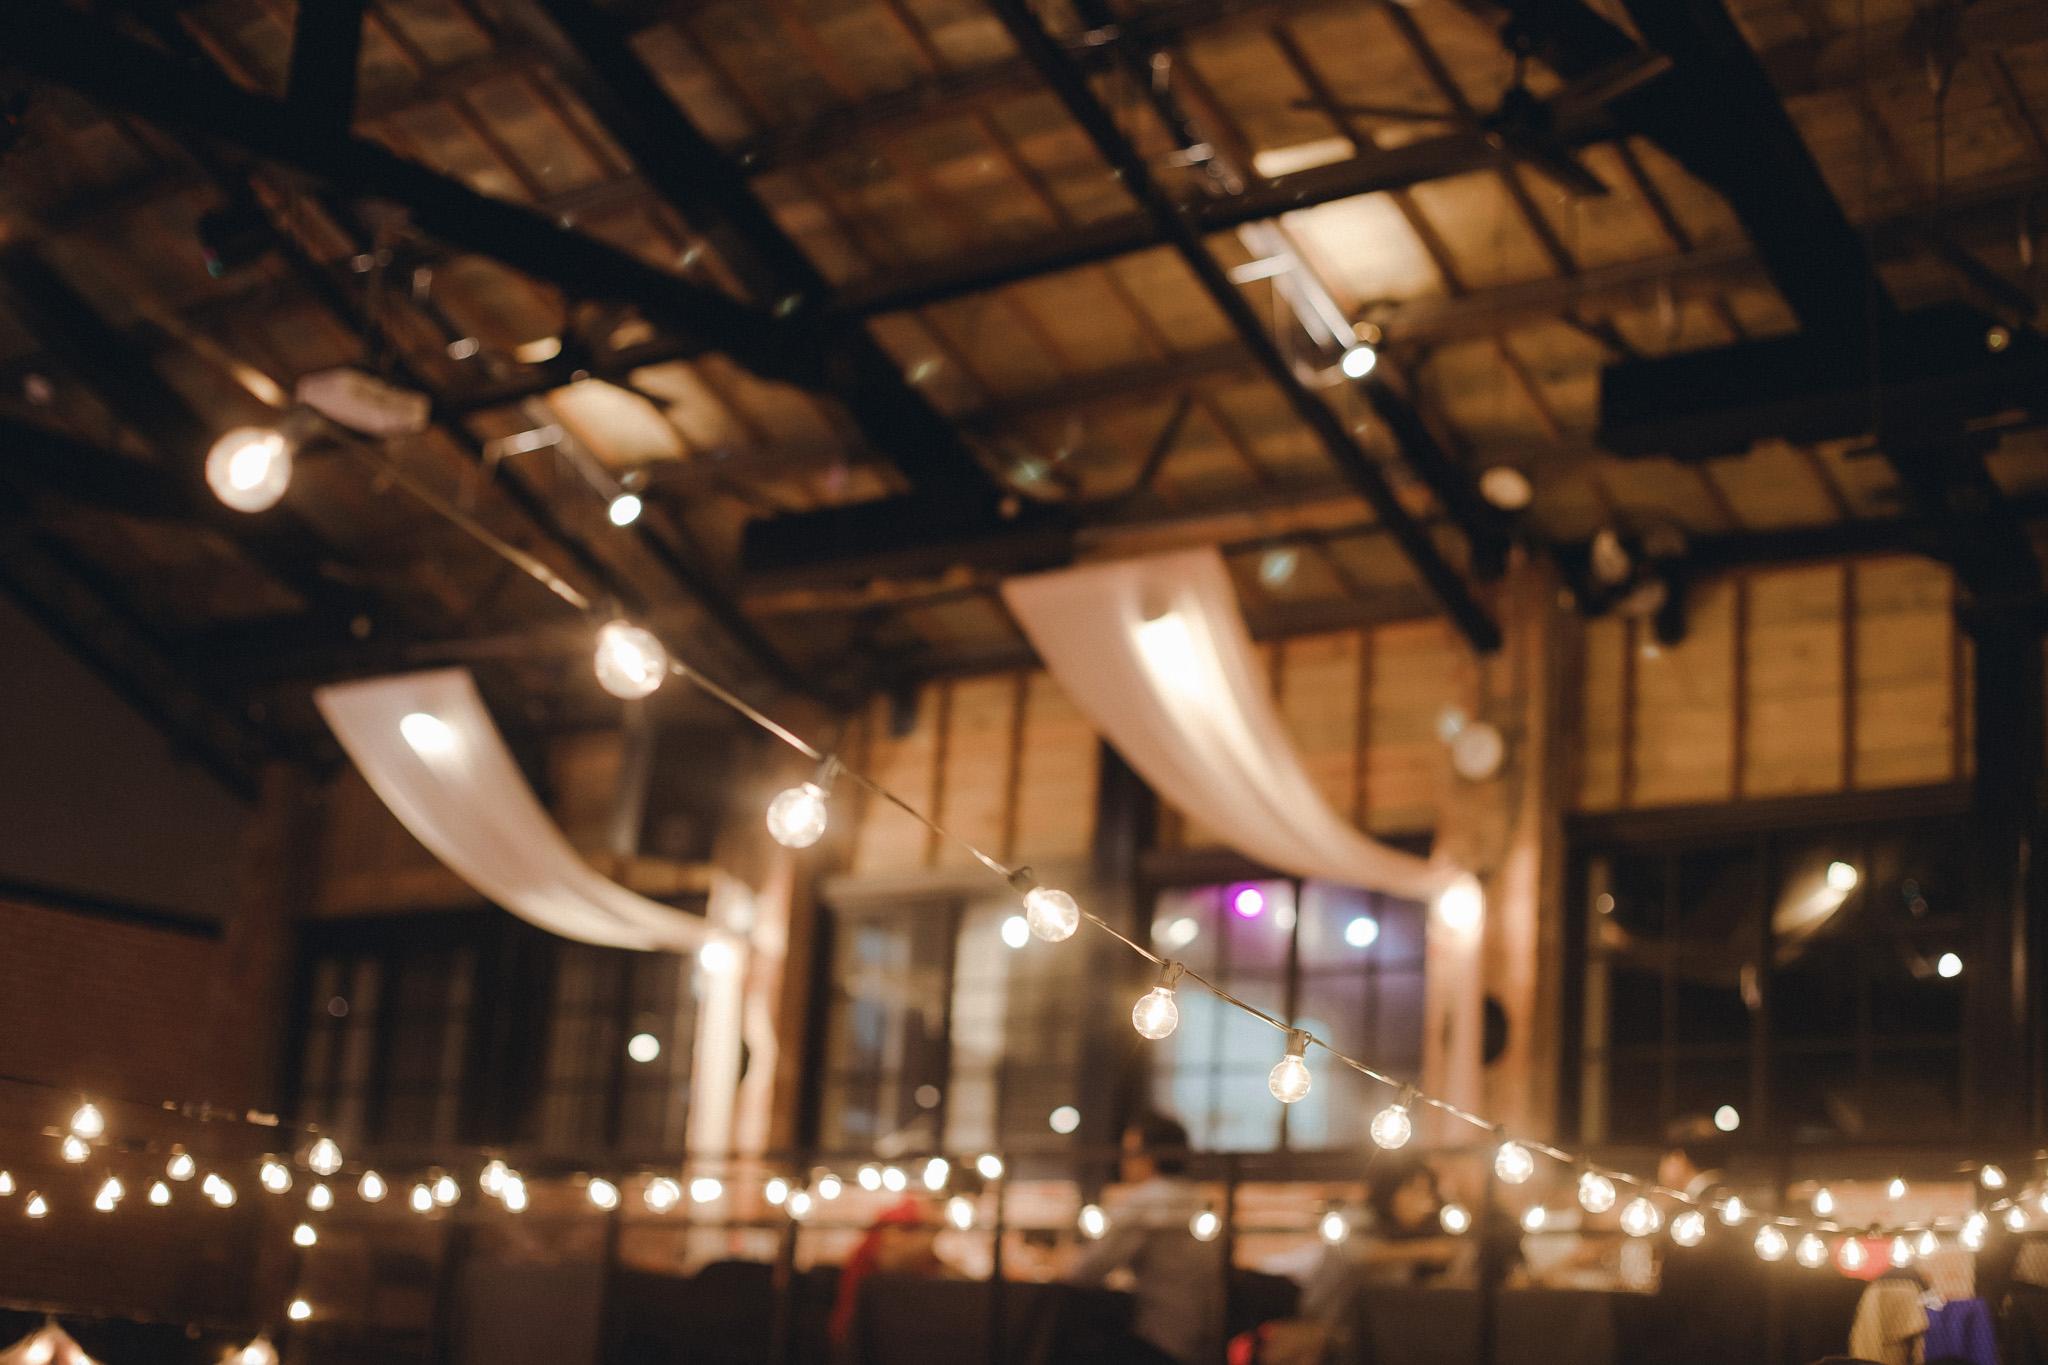 EW 台北婚攝 居米 濟南教會 Brick Yard 33 美軍俱樂部 婚禮 婚宴-79